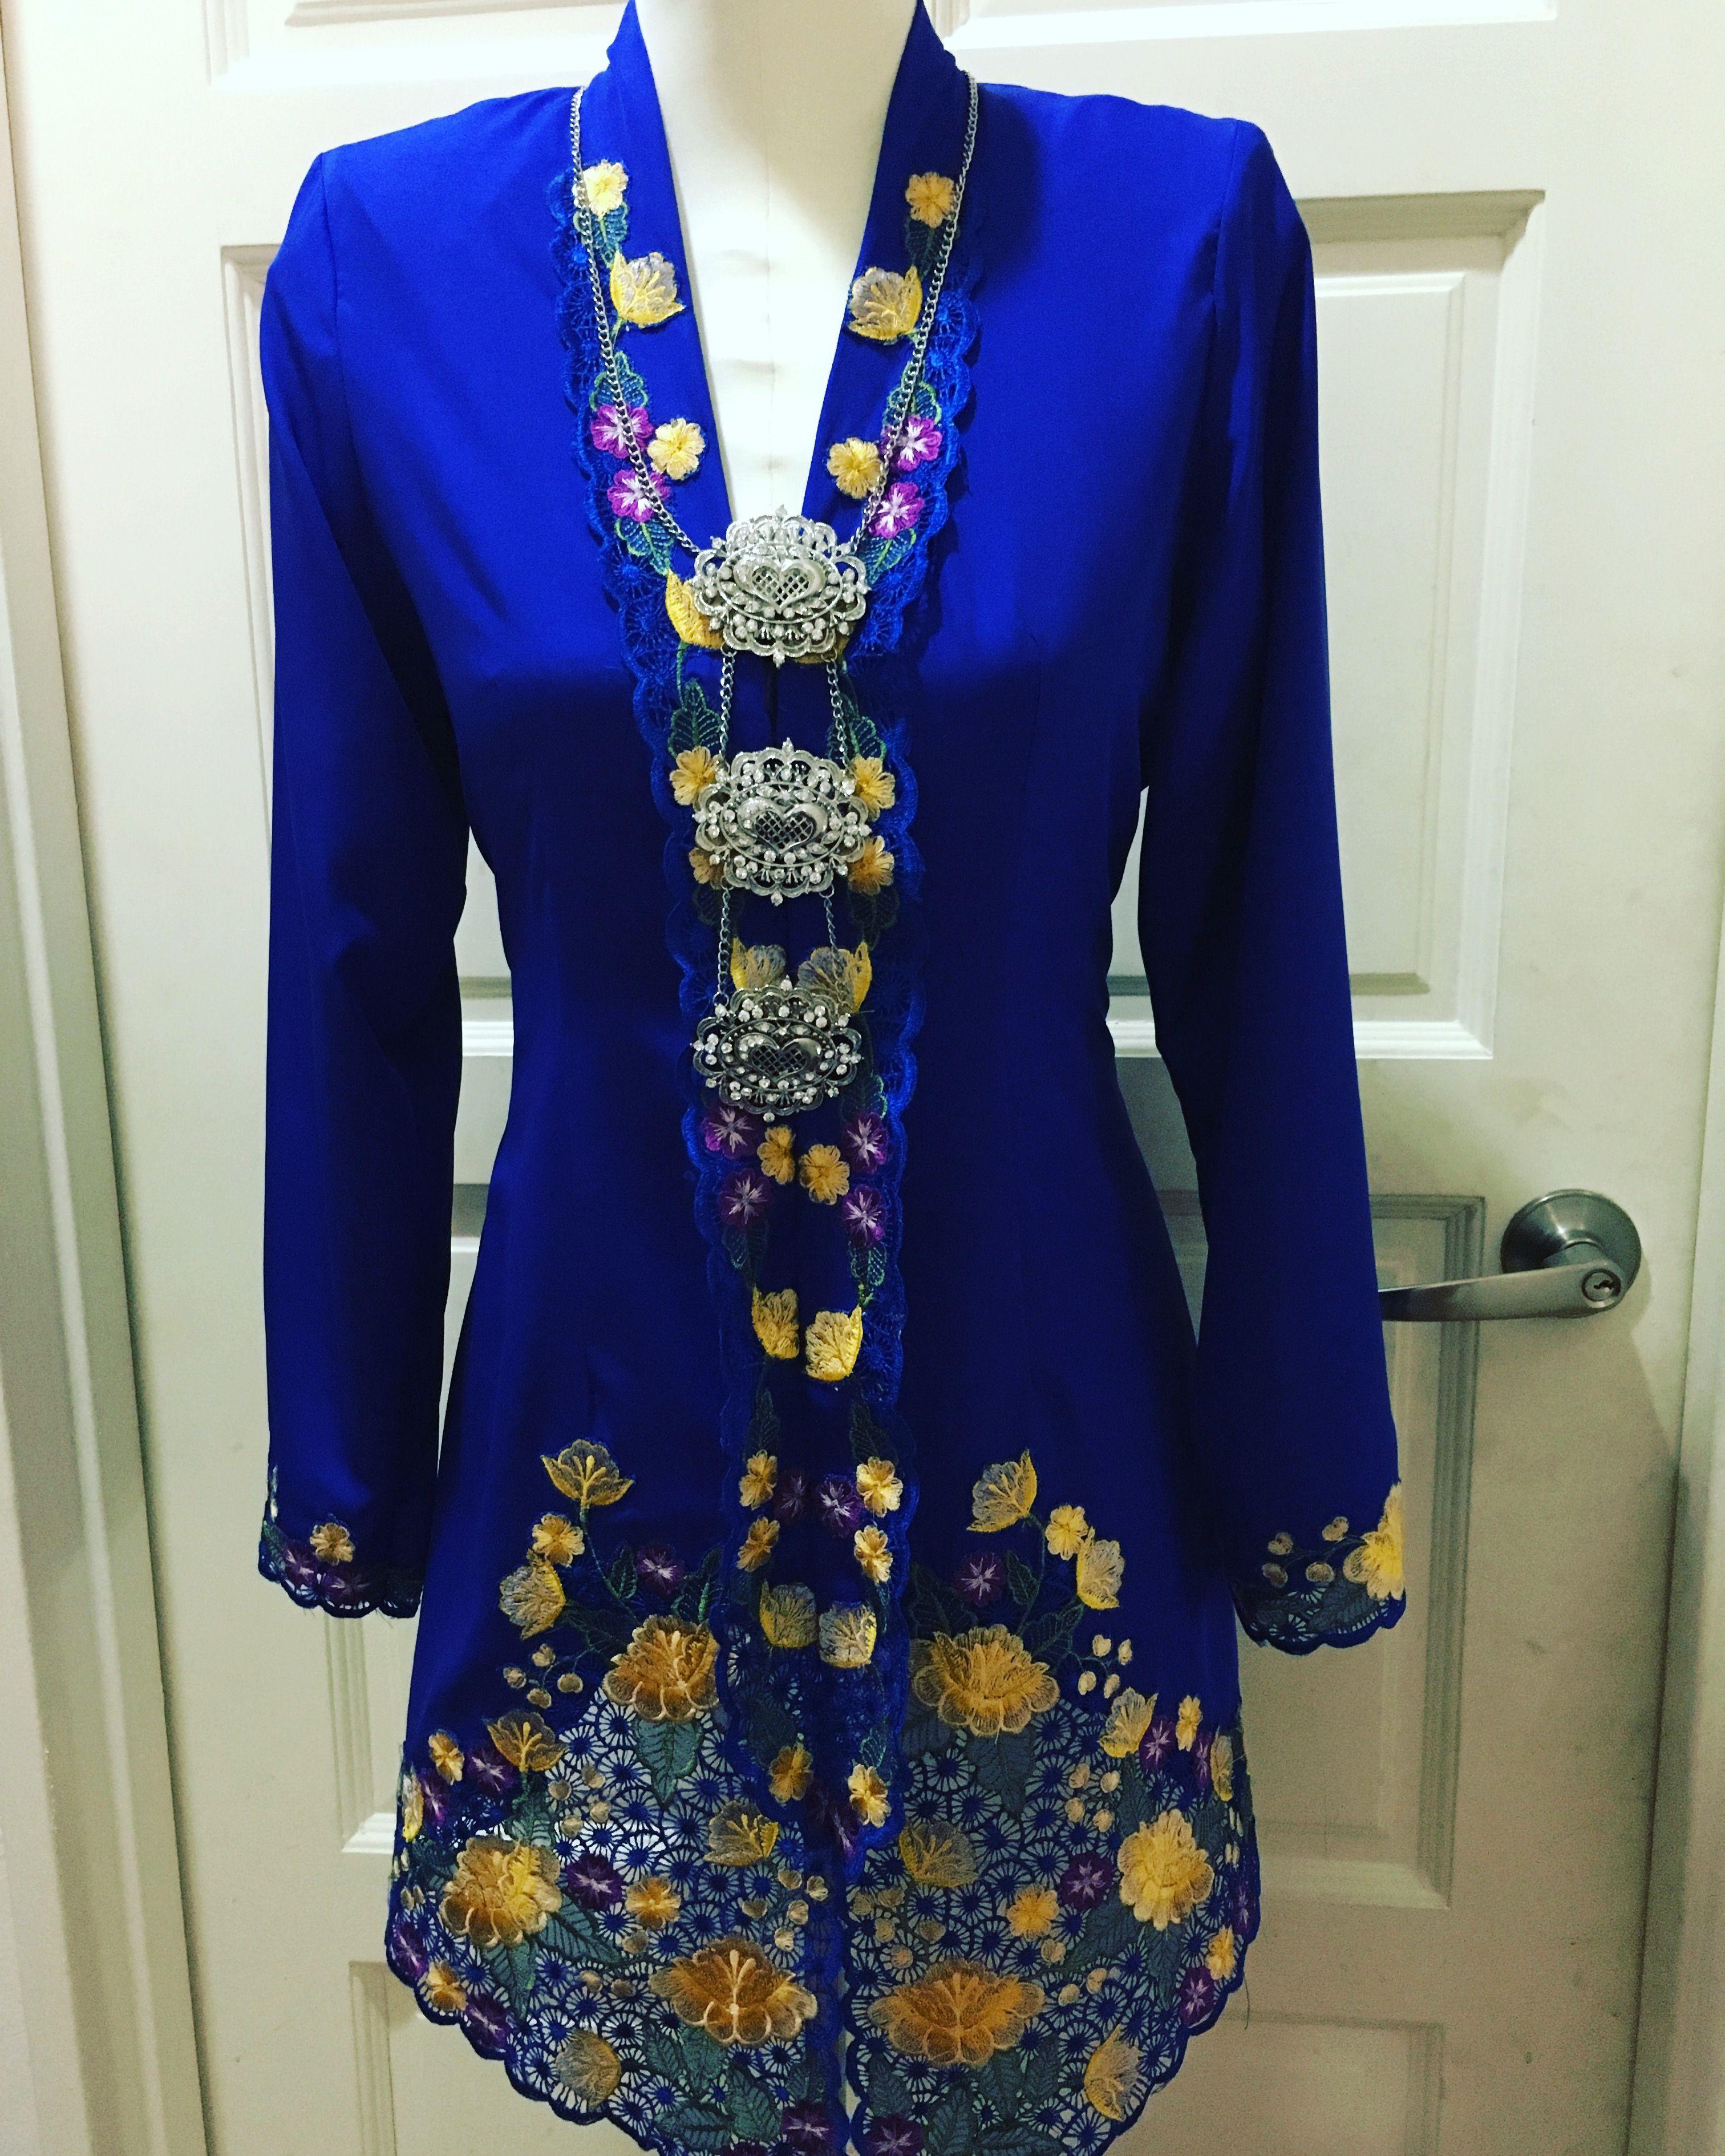 Kebaya nyonya in royal blue